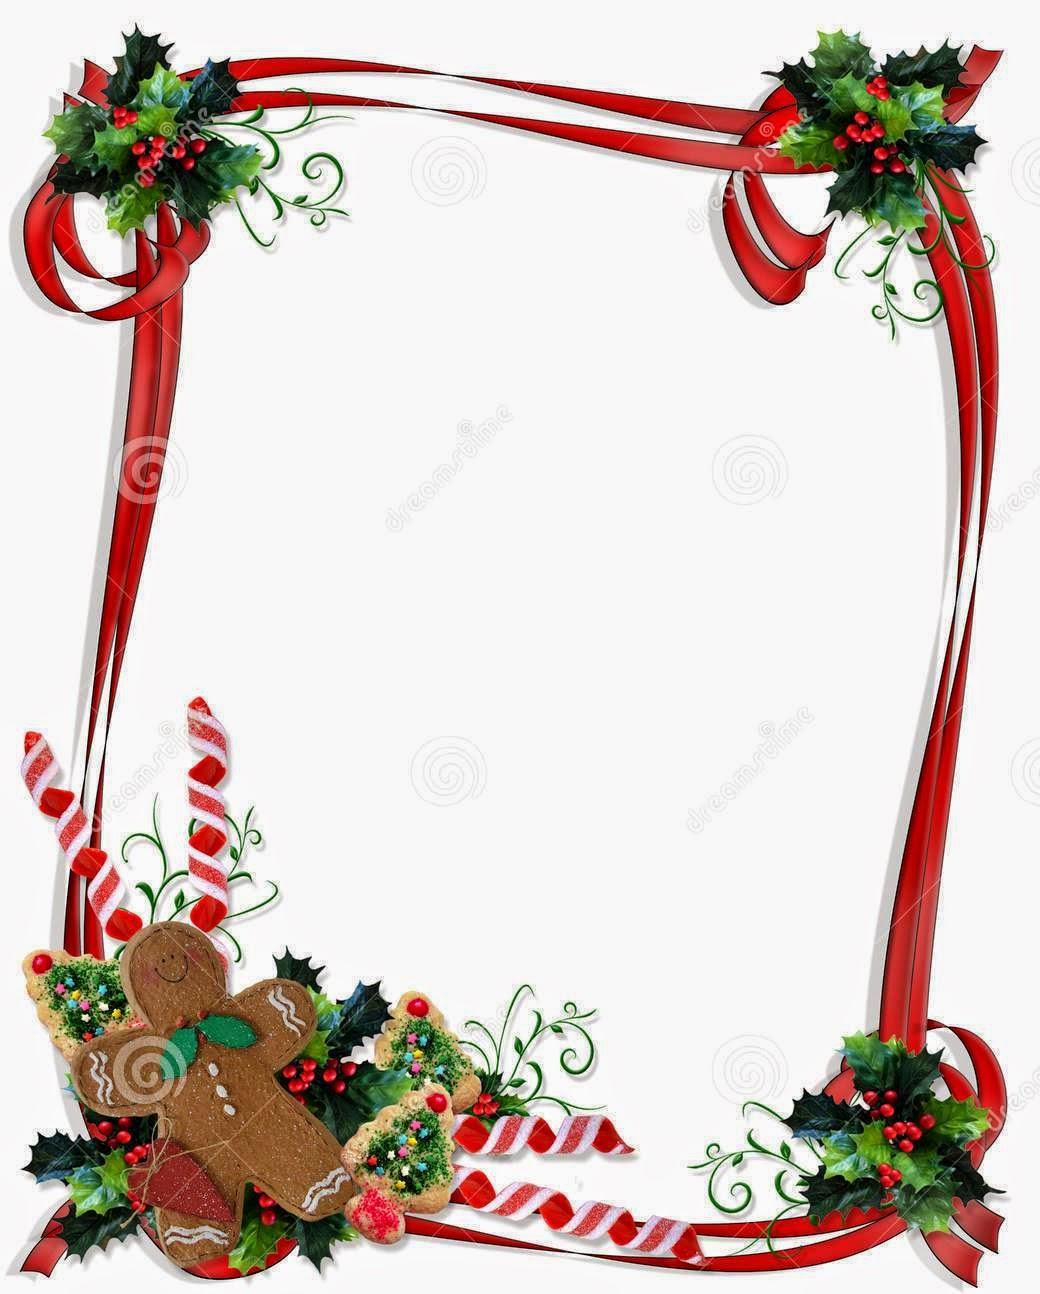 Christmas Borders Free Printables - Rr Collections - Free Printable Christmas Borders